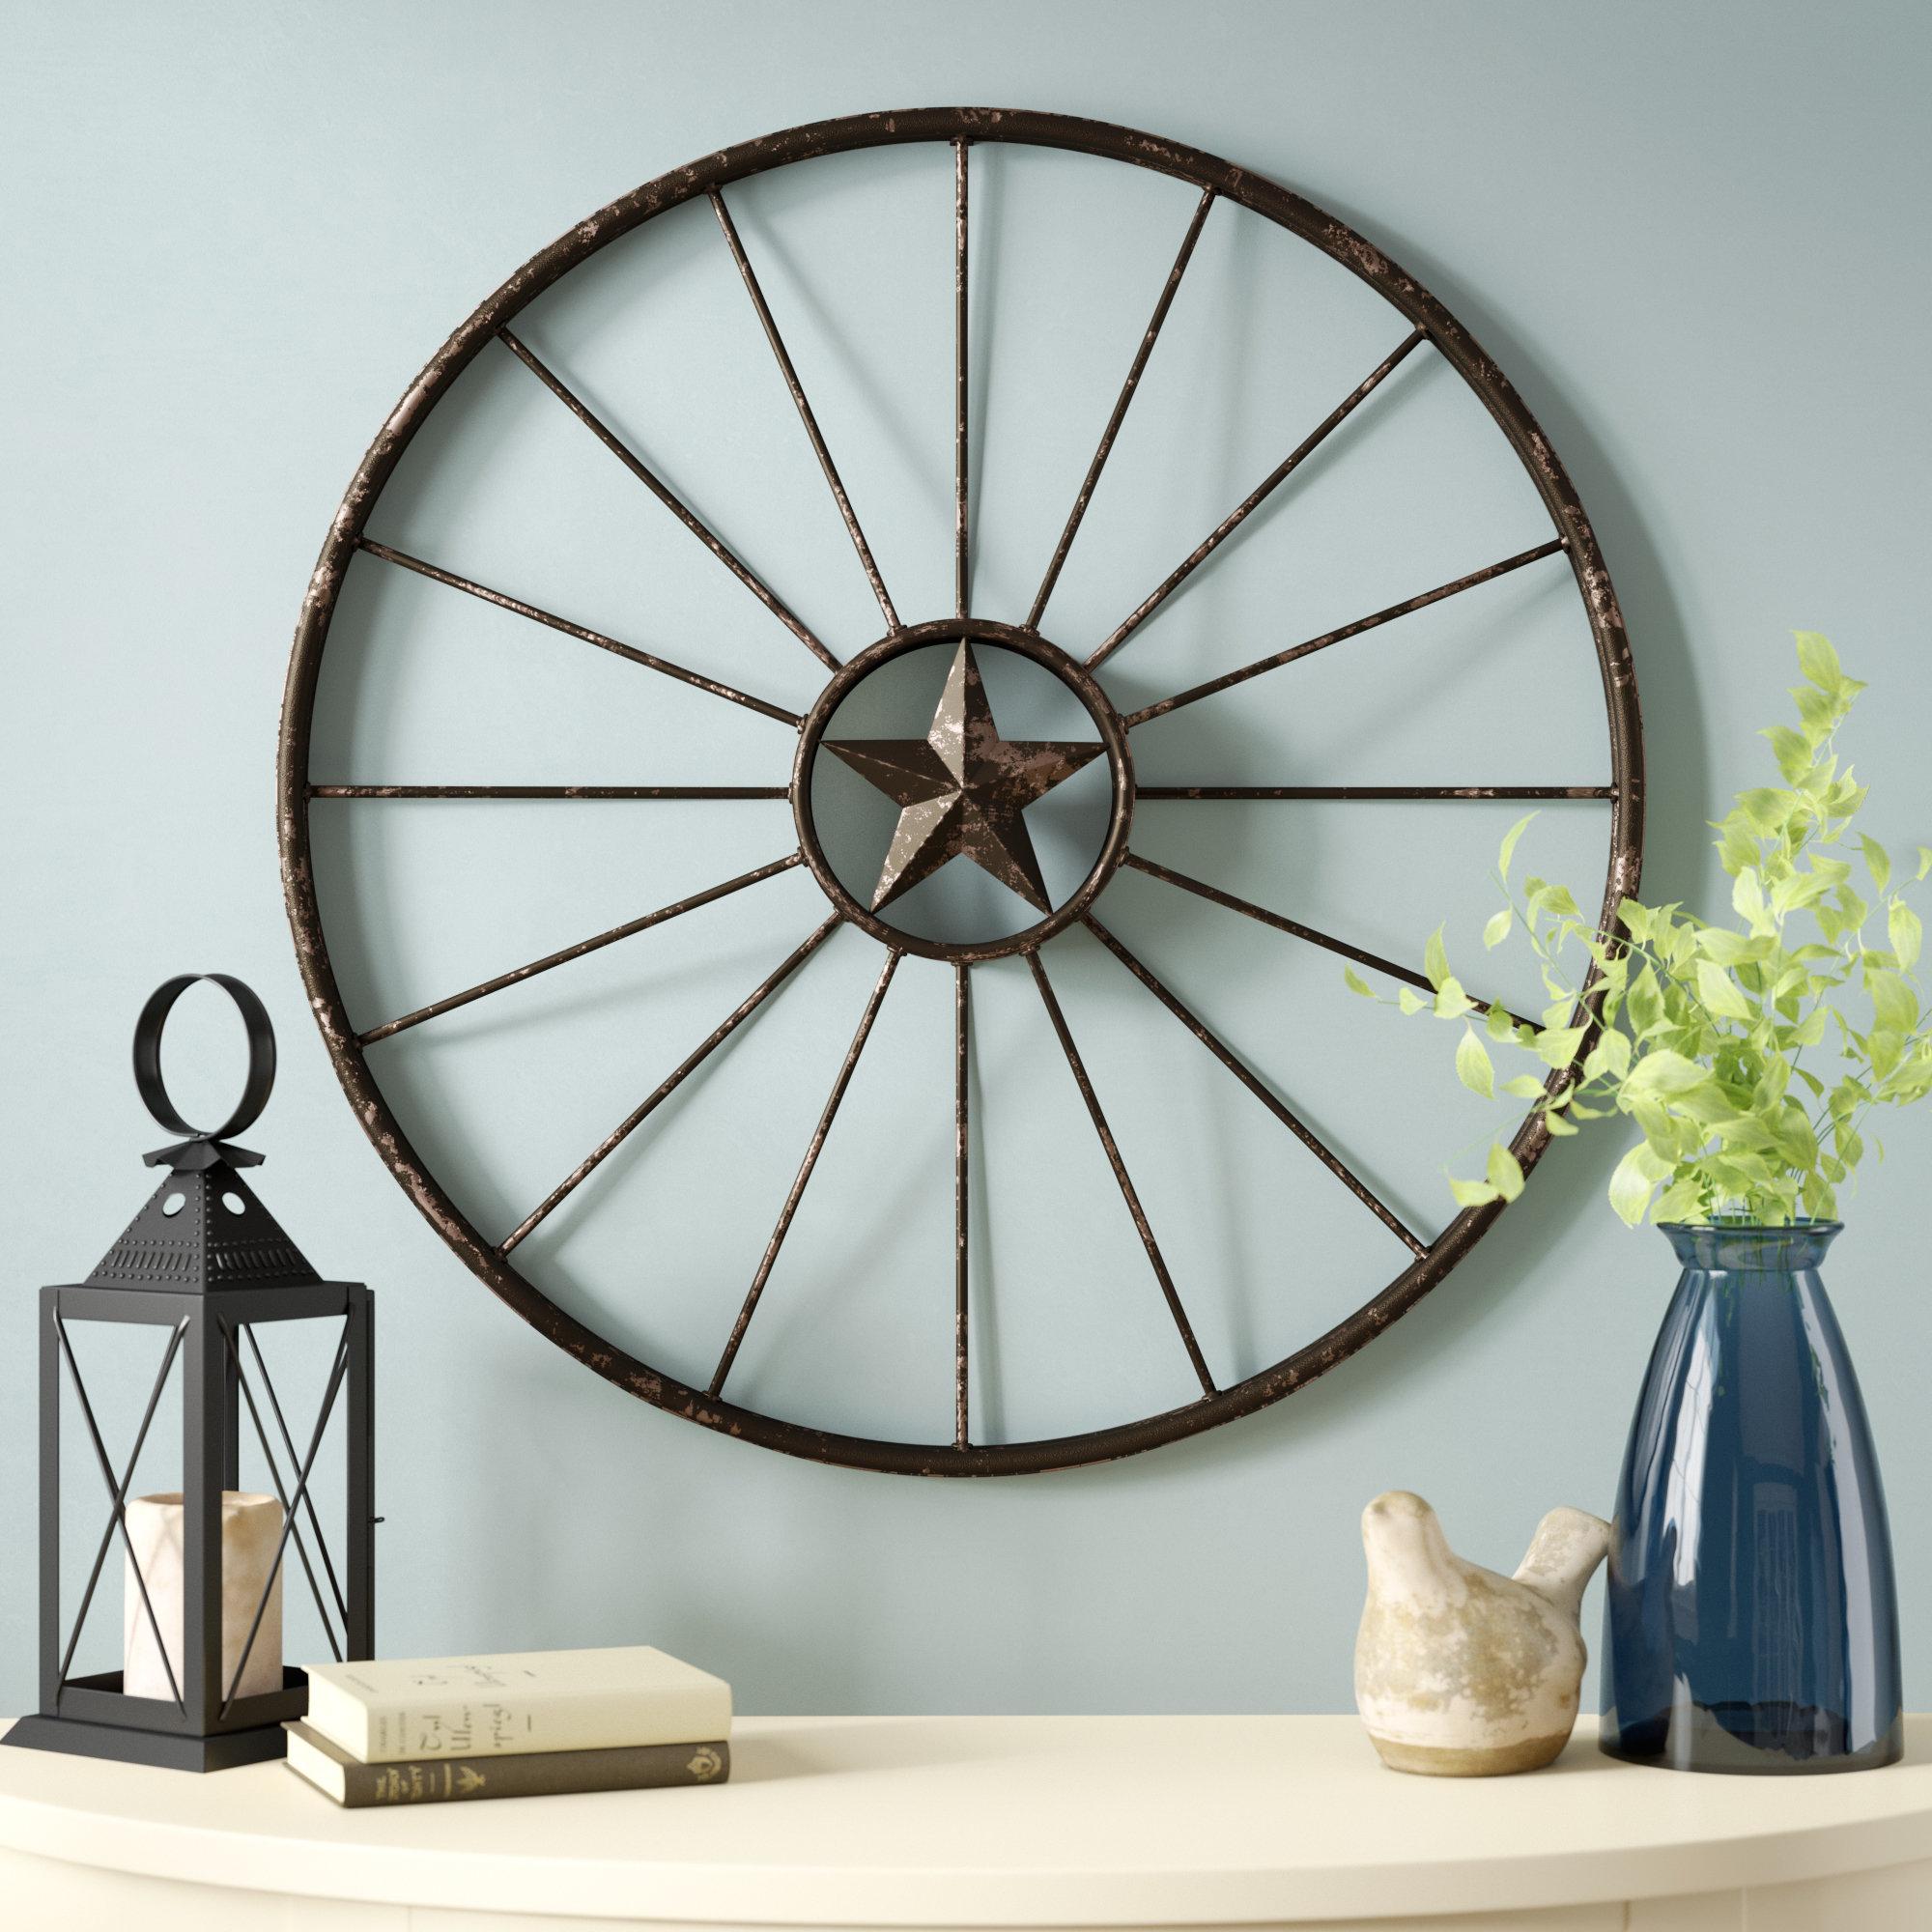 Bike Wheel Wall Decor | Wayfair inside Millanocket Metal Wheel Photo Holder Wall Decor (Image 2 of 30)